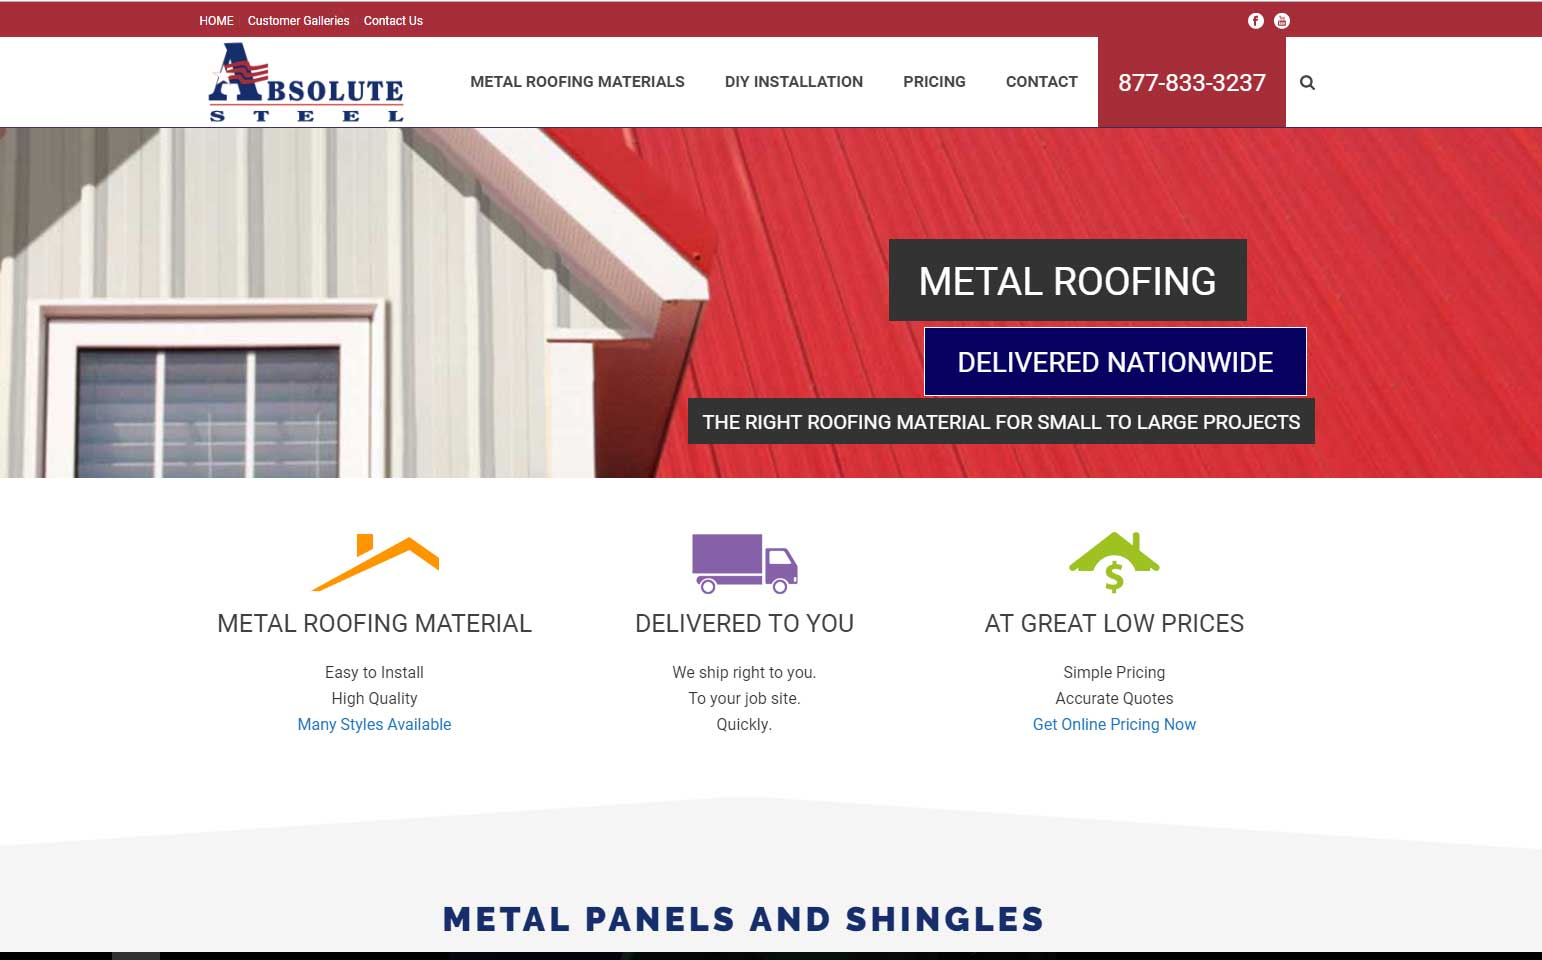 Metal Roofing Source